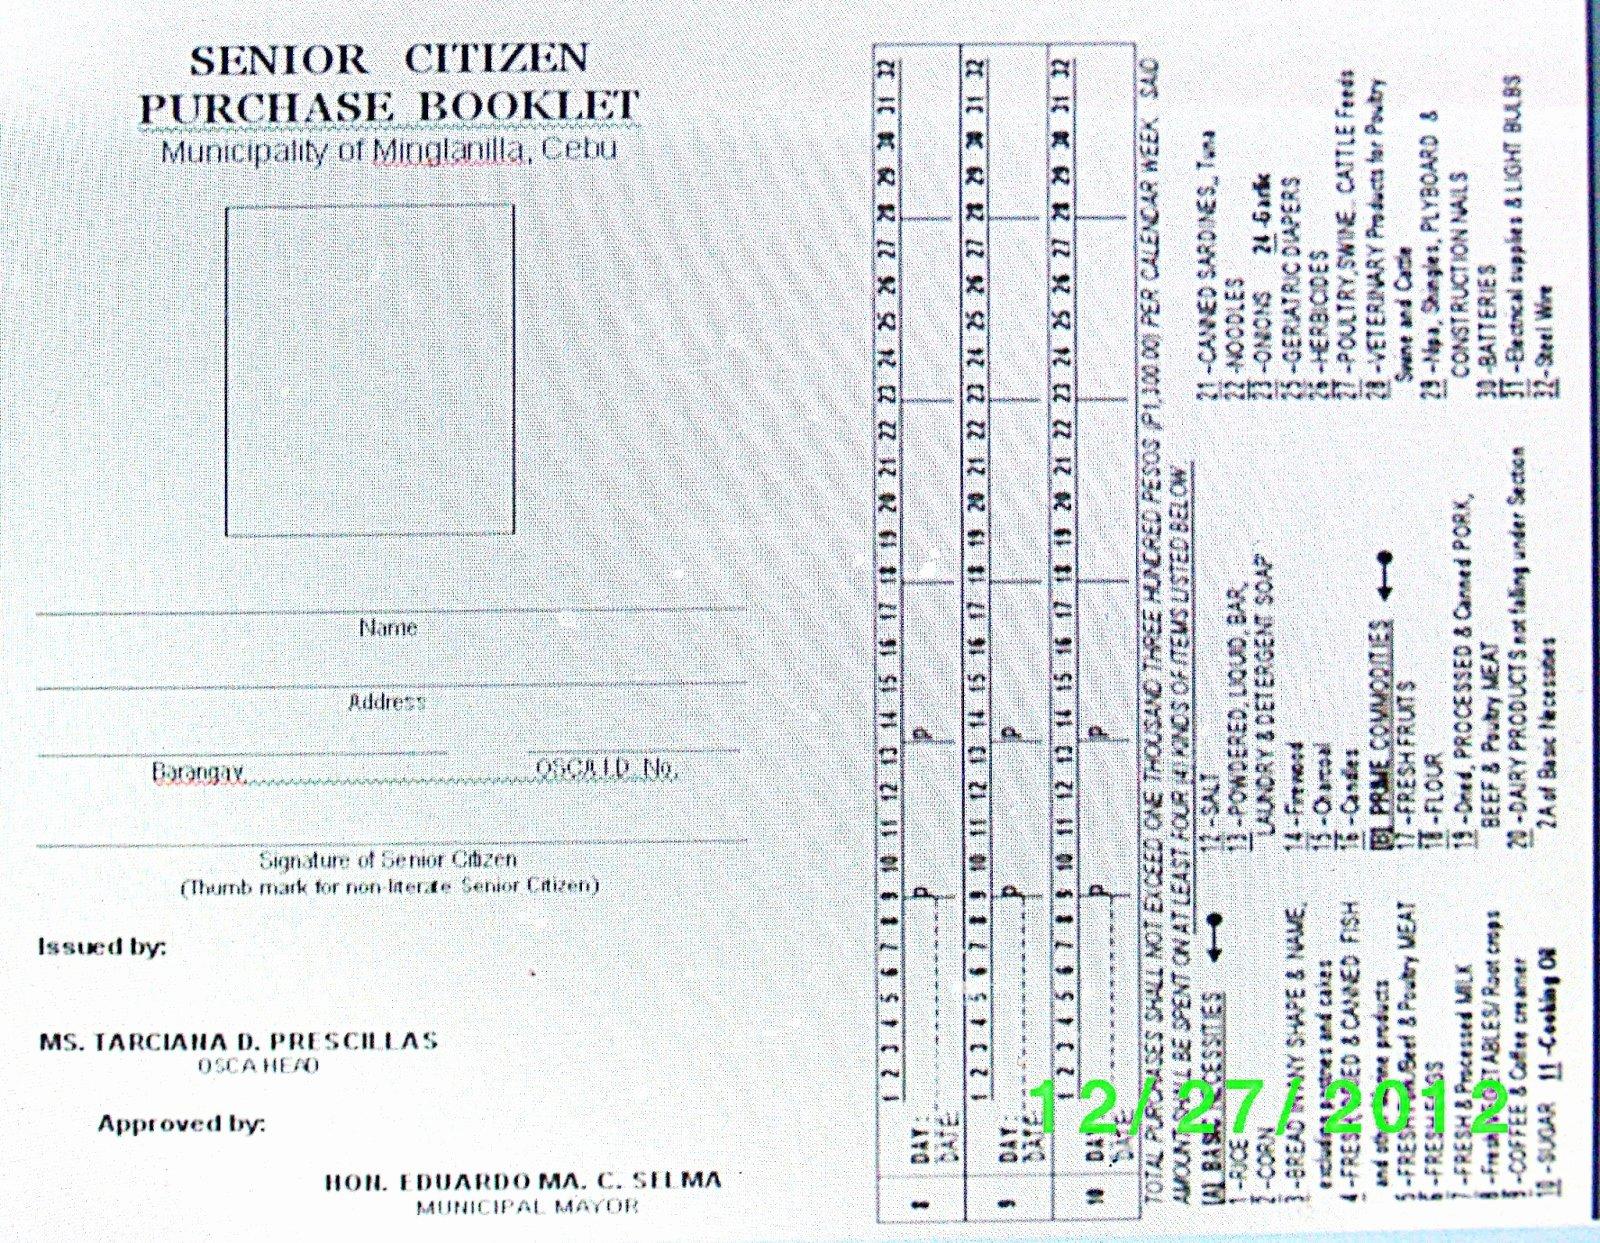 3 by 5 Index Card Template Google Docs Beautiful In Exsilio Spiritum R A No 9994 New Senior Citizen